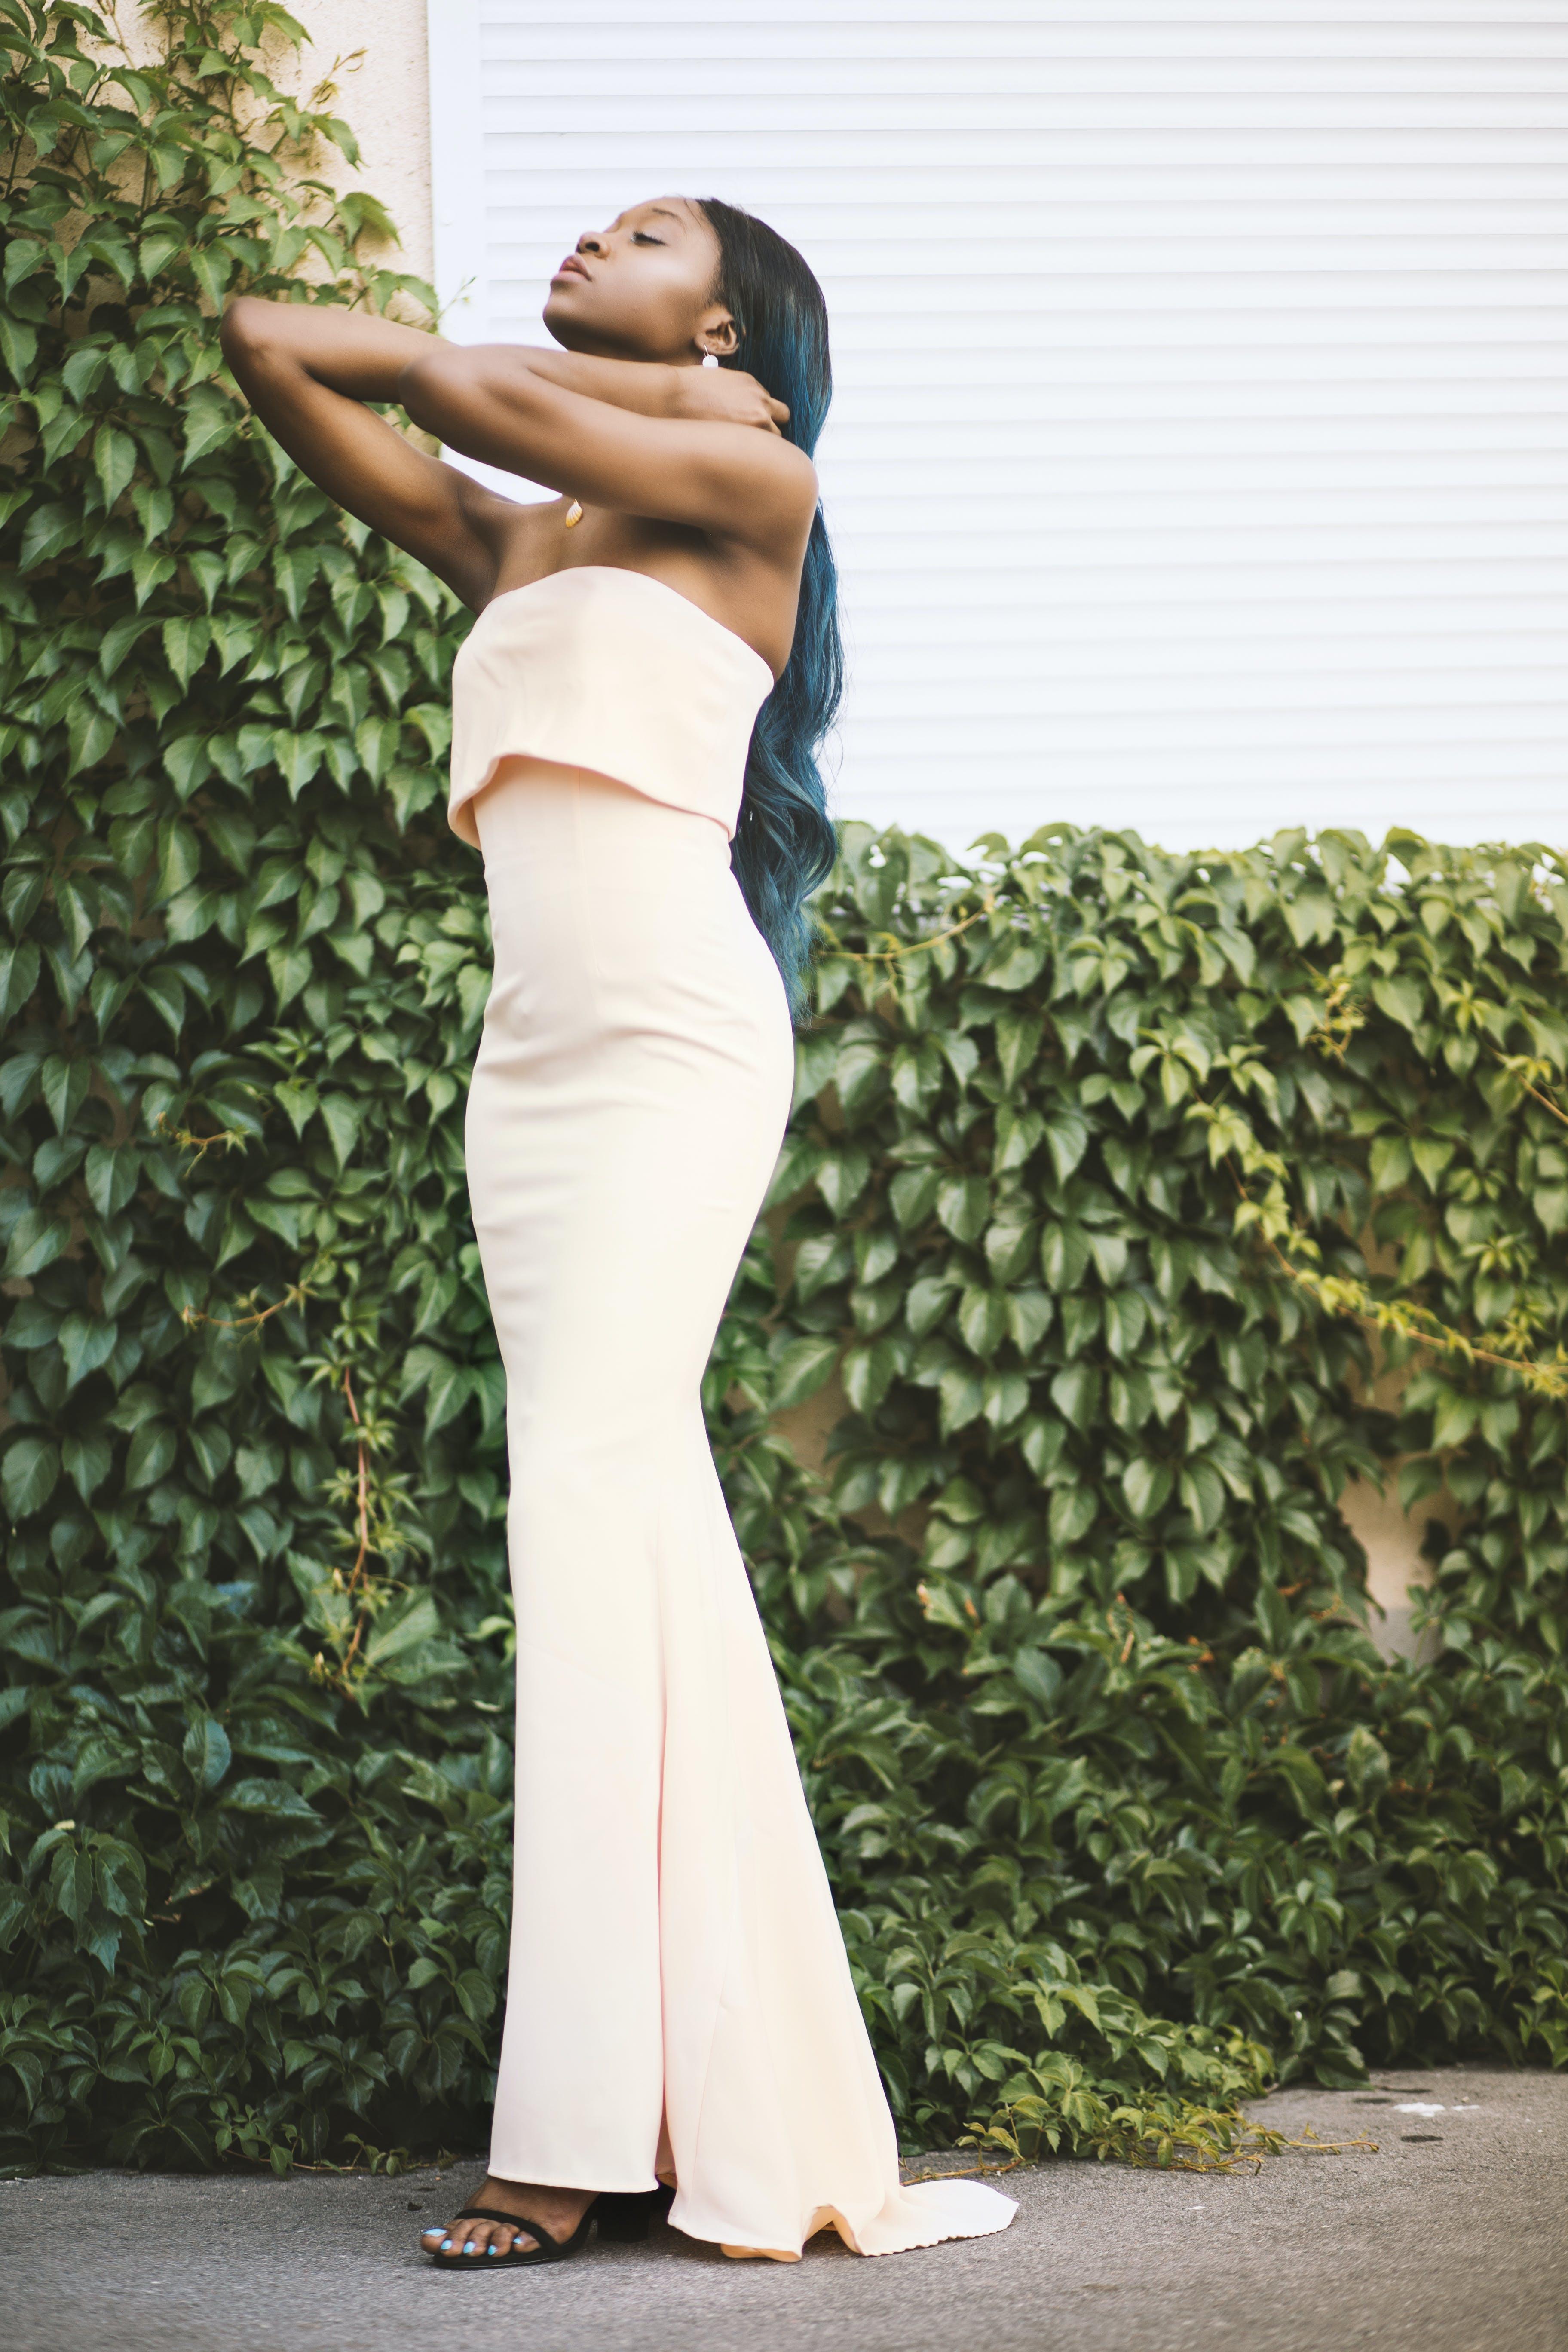 Kostenloses Stock Foto zu dame, farbige frau, fashion, frau